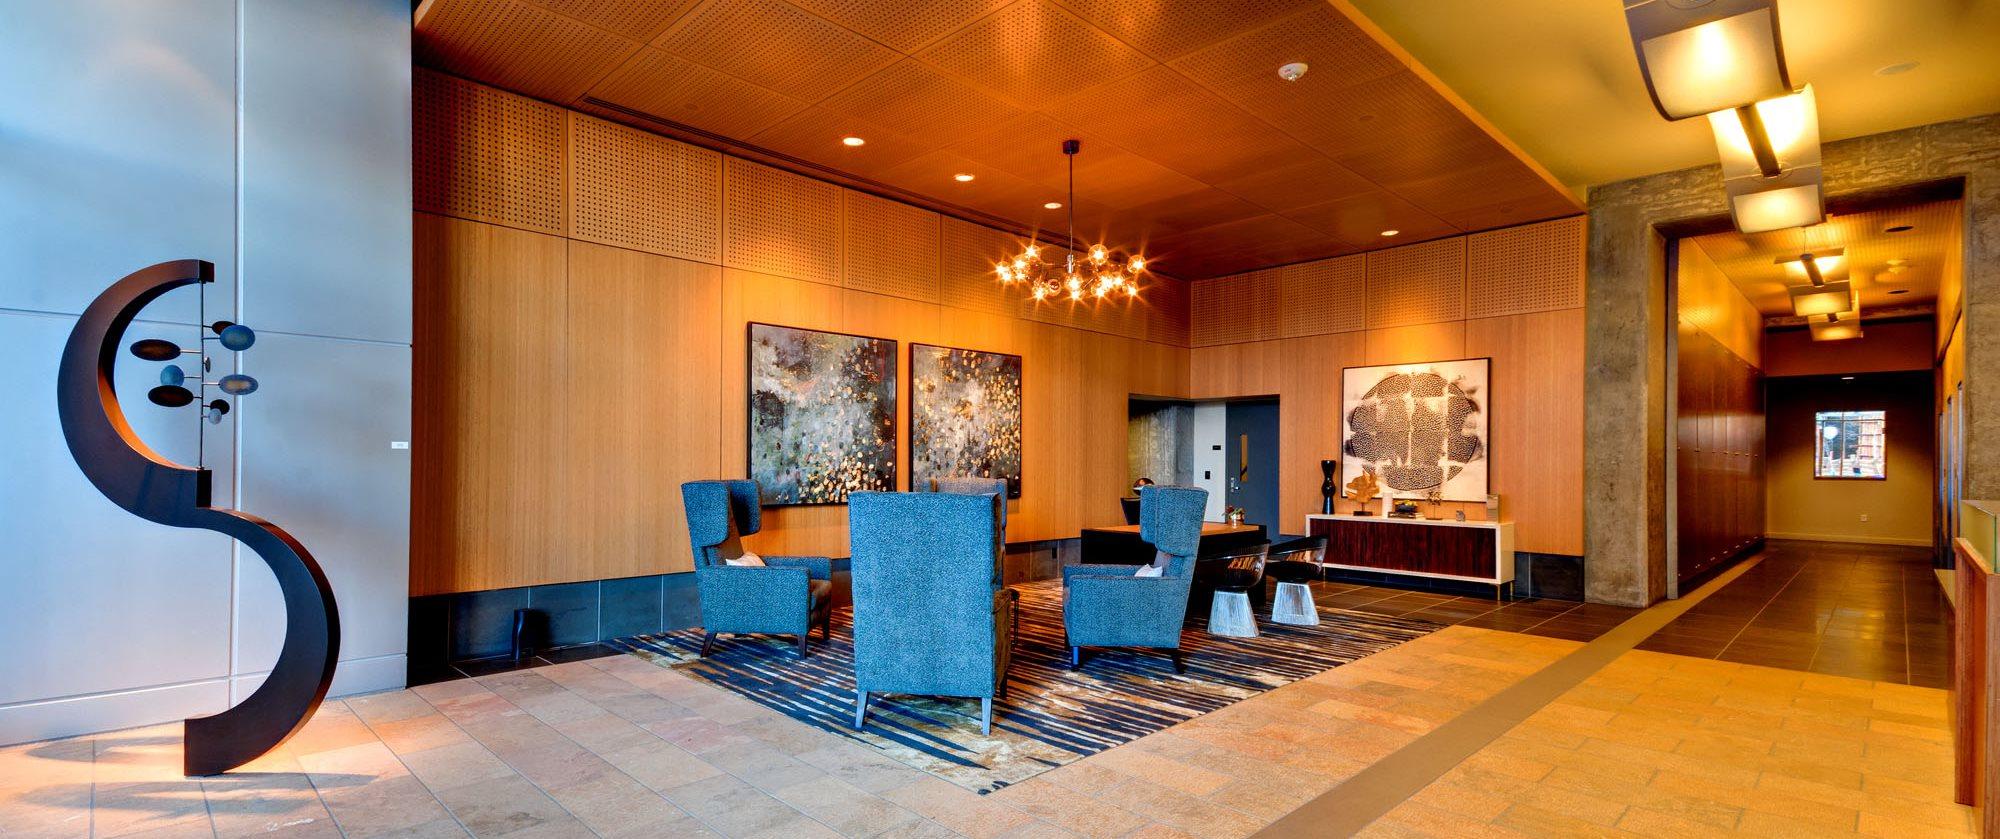 Aspira Apartments in Belltown Seattle WA